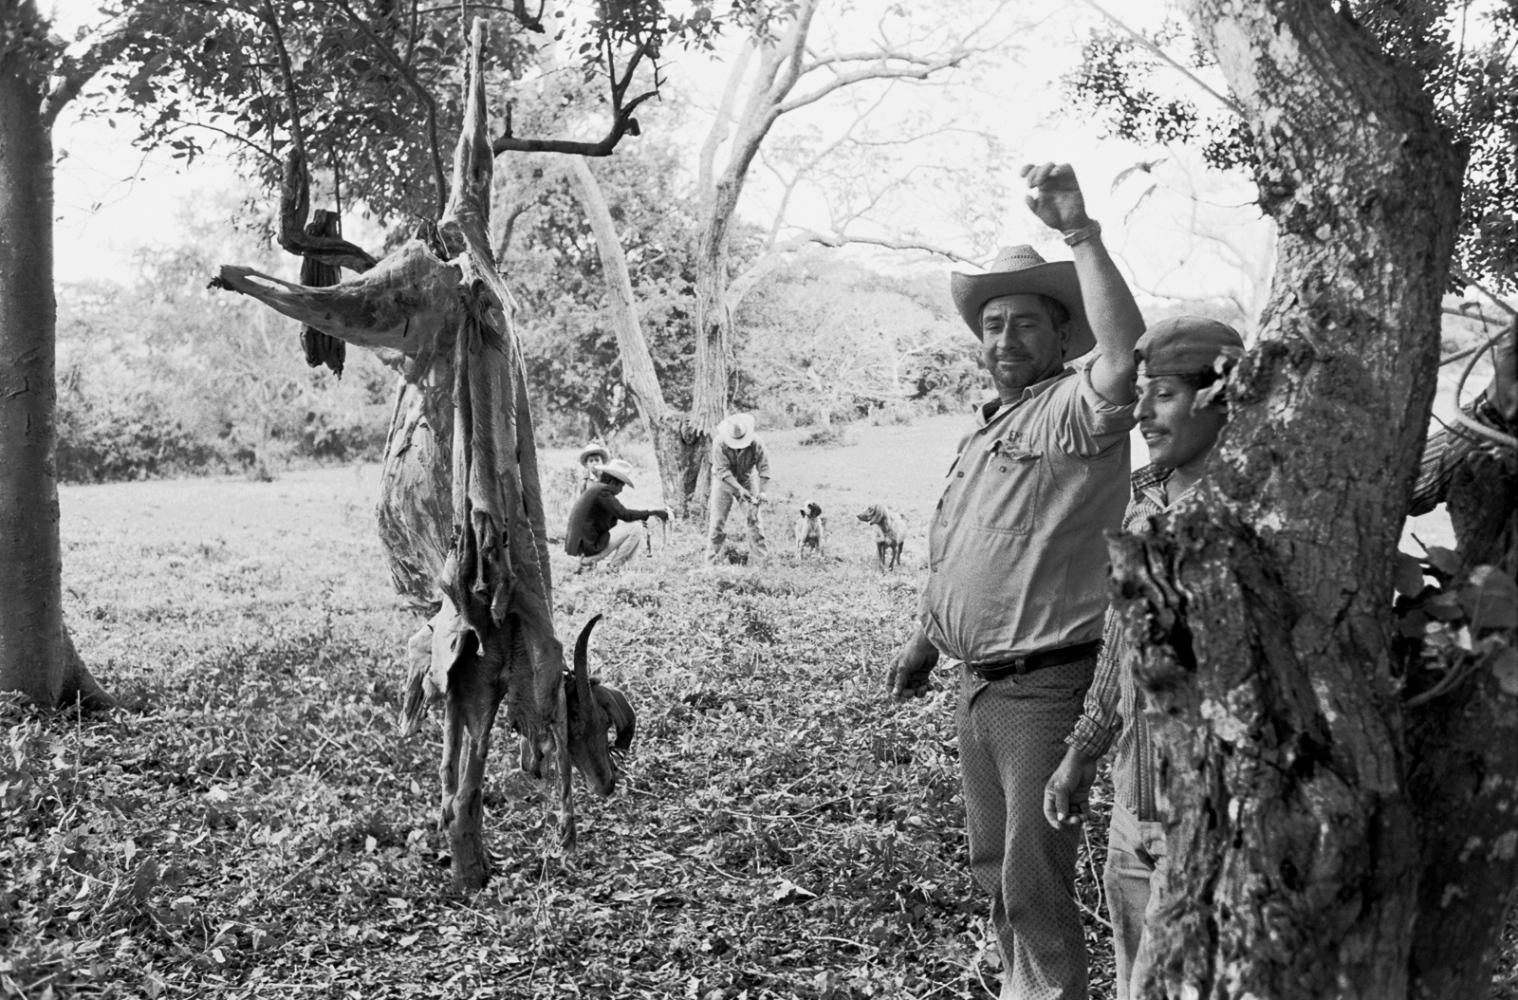 Art and Documentary Photography - Loading _La_Barbacoa__Bejuco1978__sdeswaan.jpg